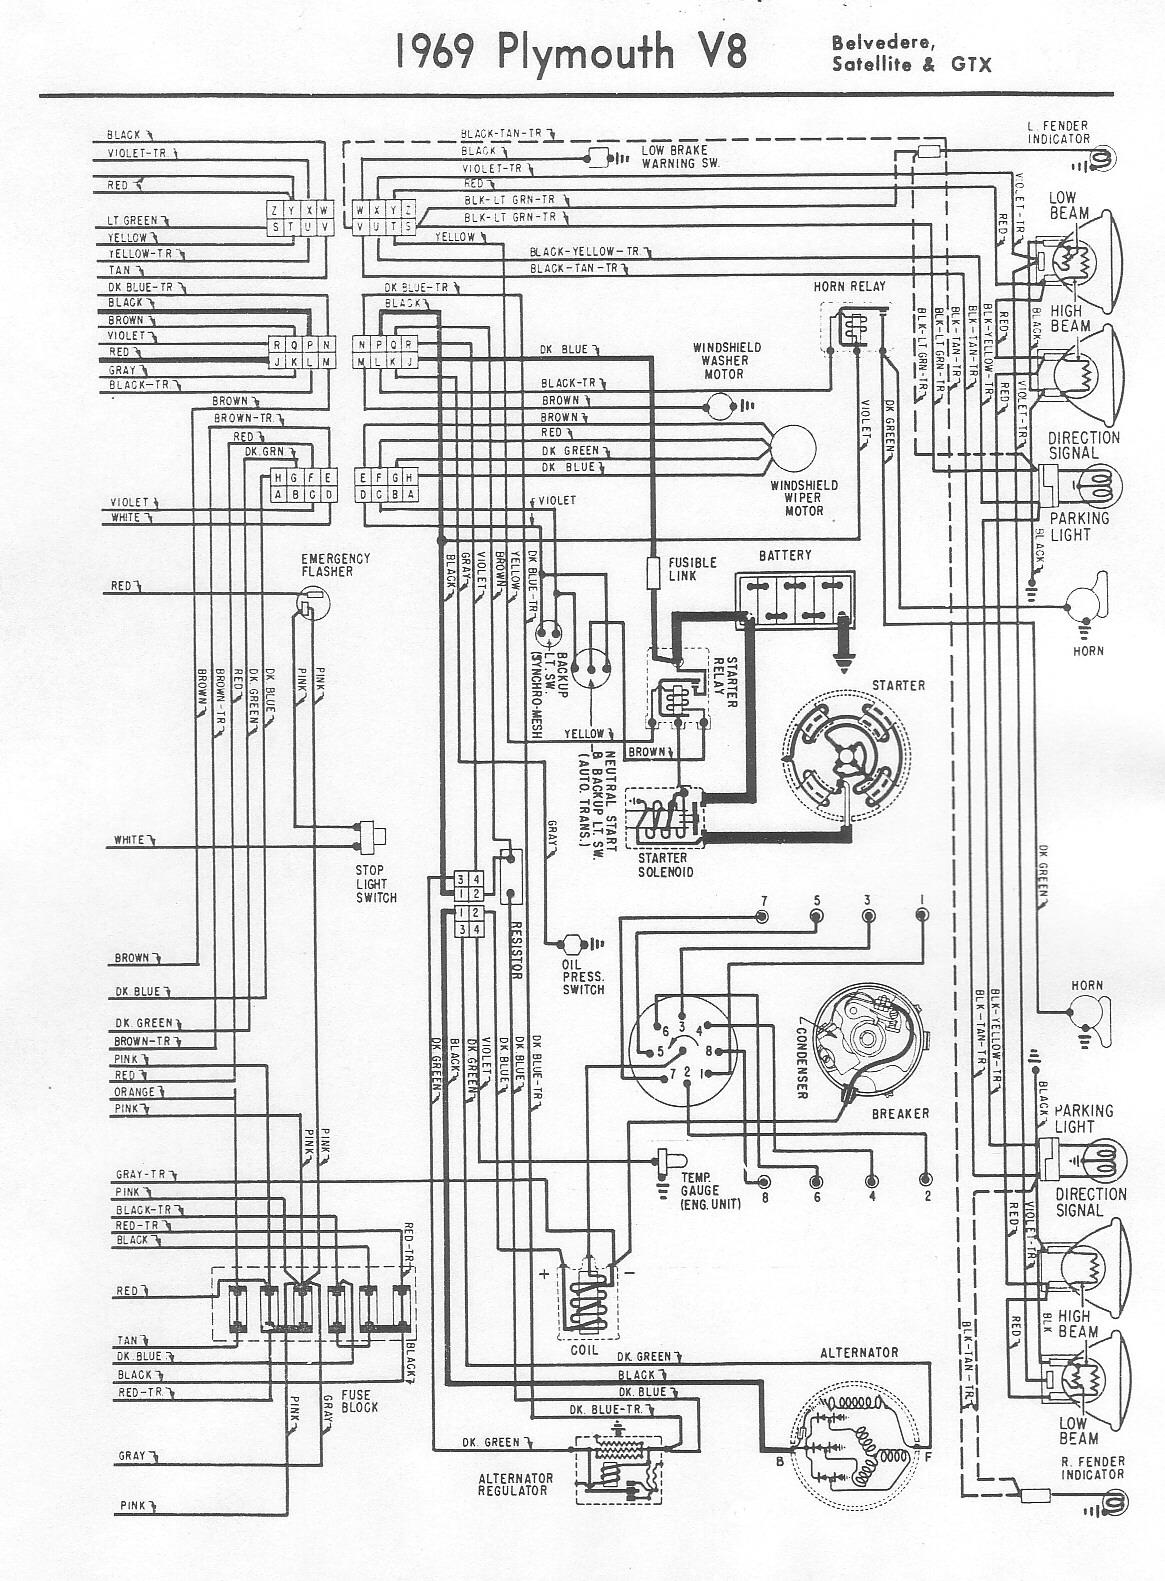 1968 plymouth roadrunner wiring diagram